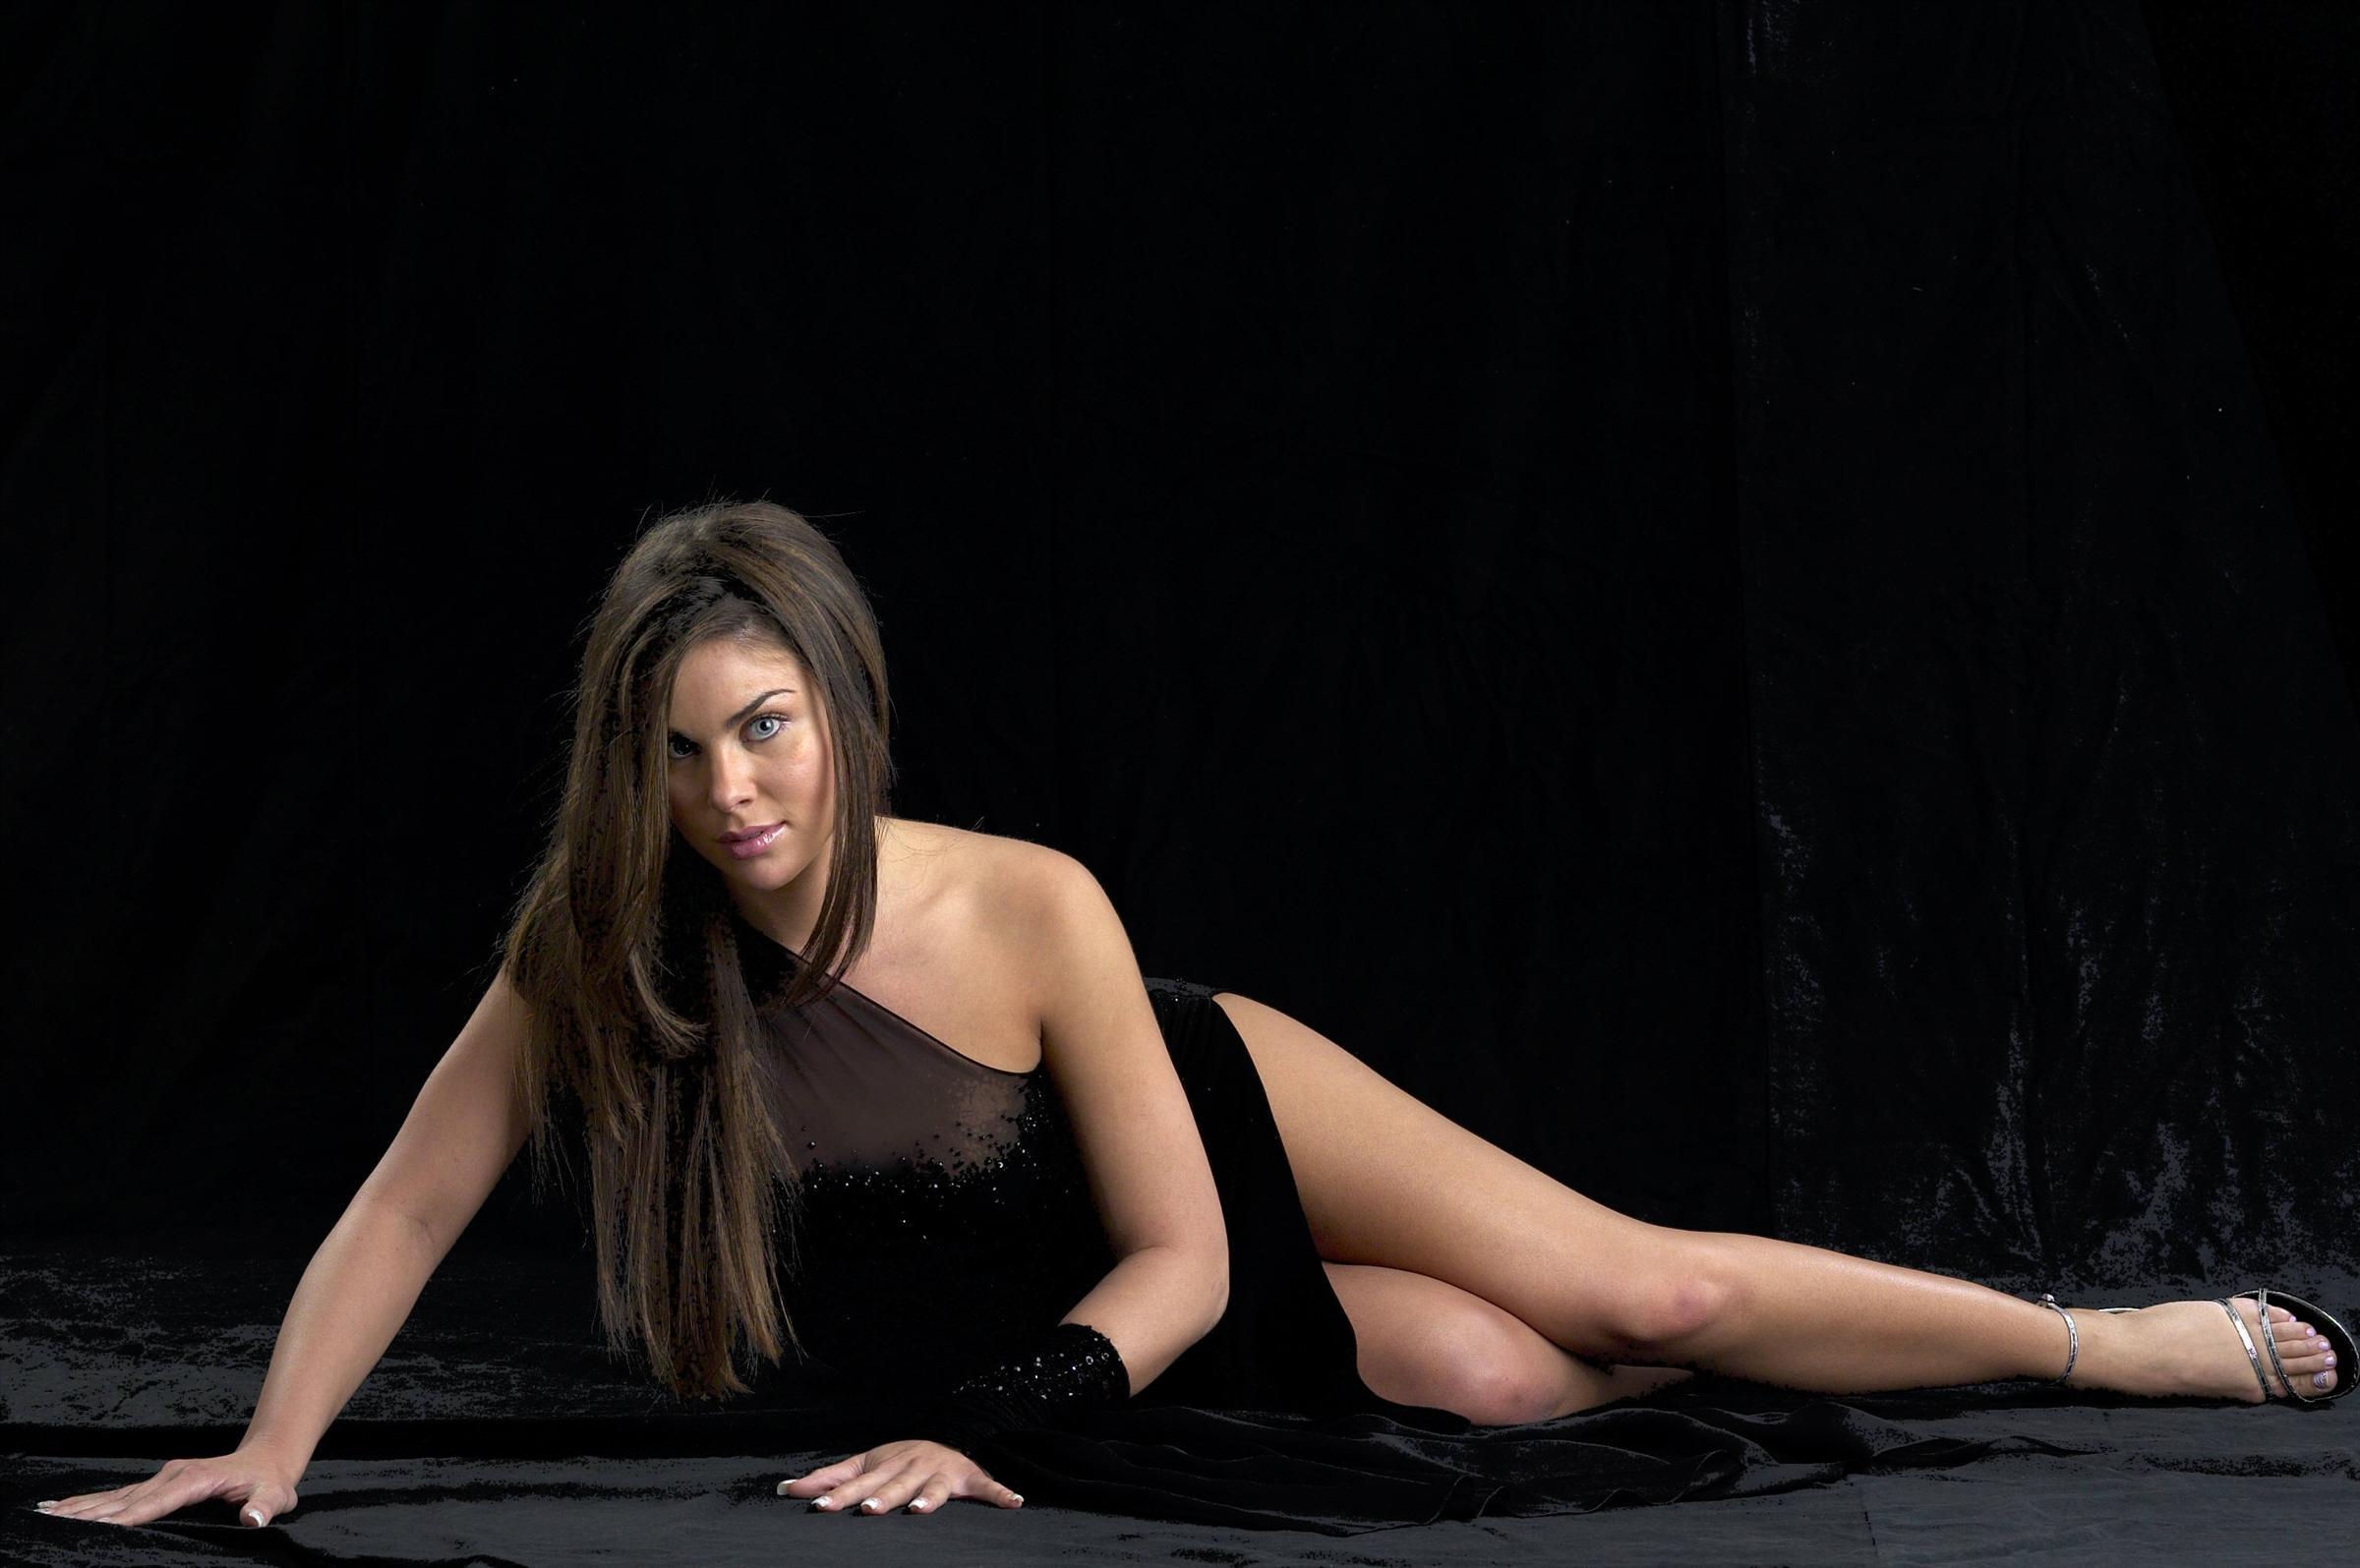 Nadia Bjorlin Nude Open Pics 48